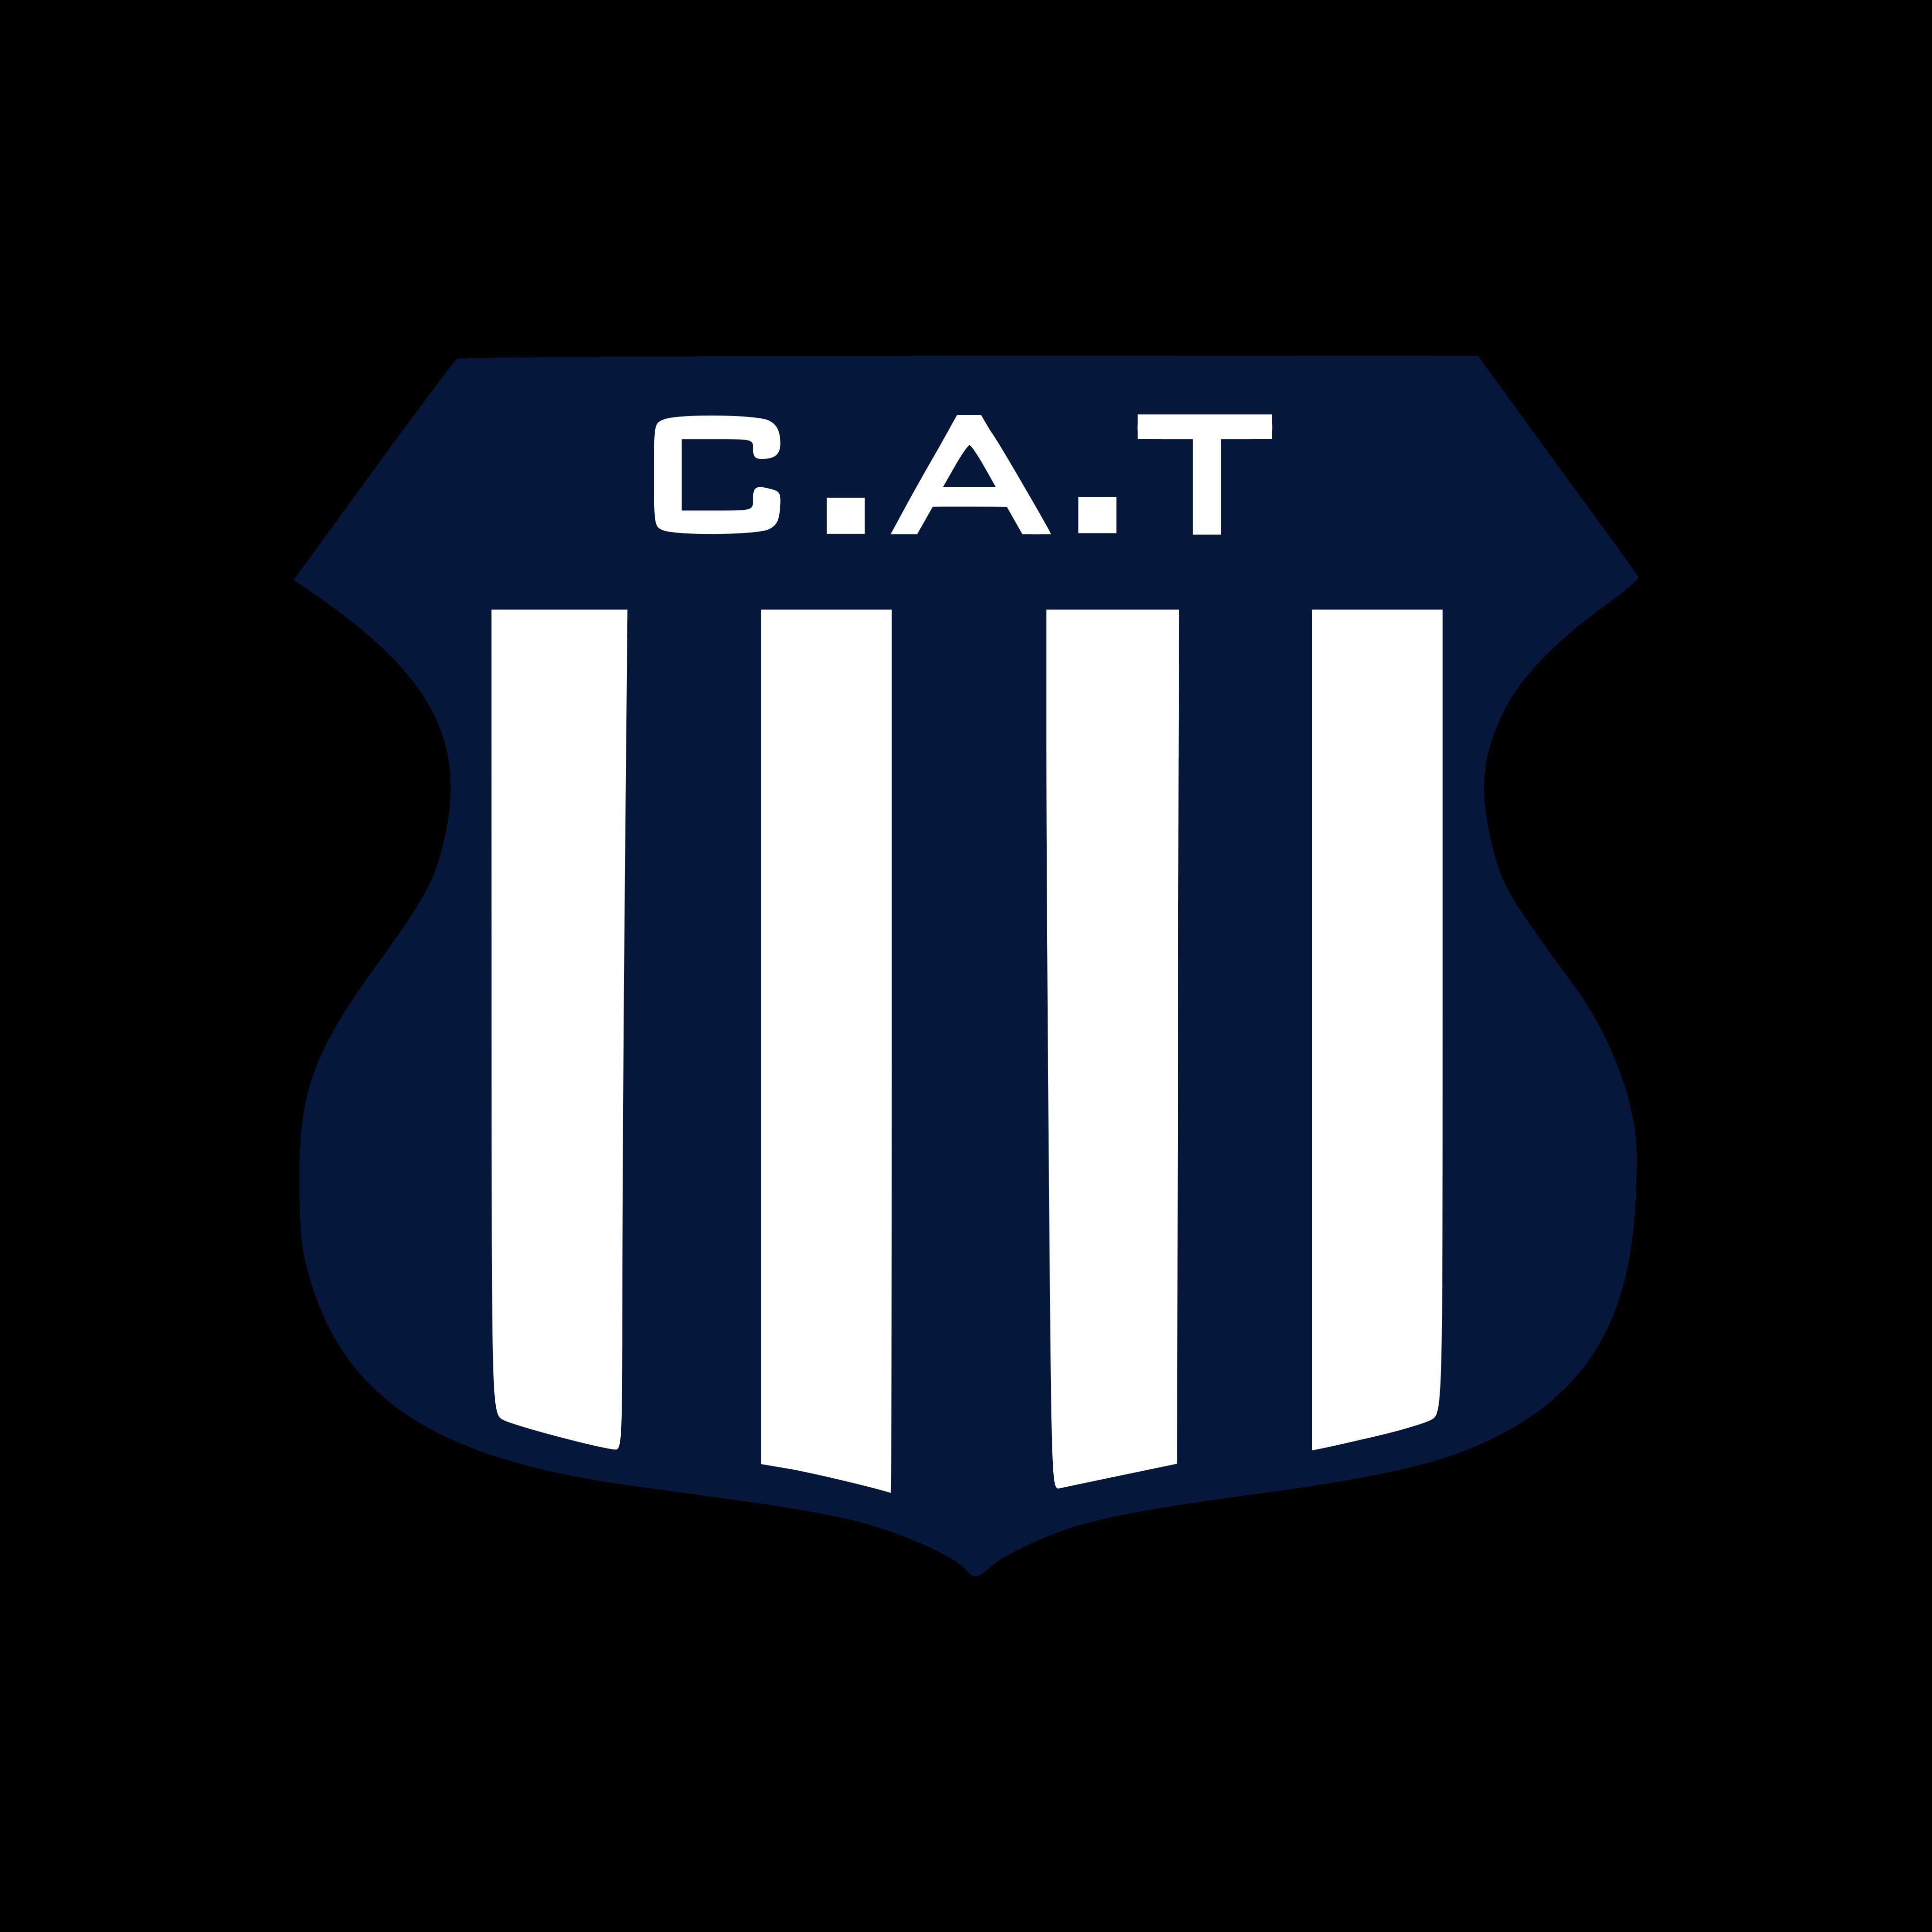 club talleres logo 0 - Club Atlético Talleres Logo